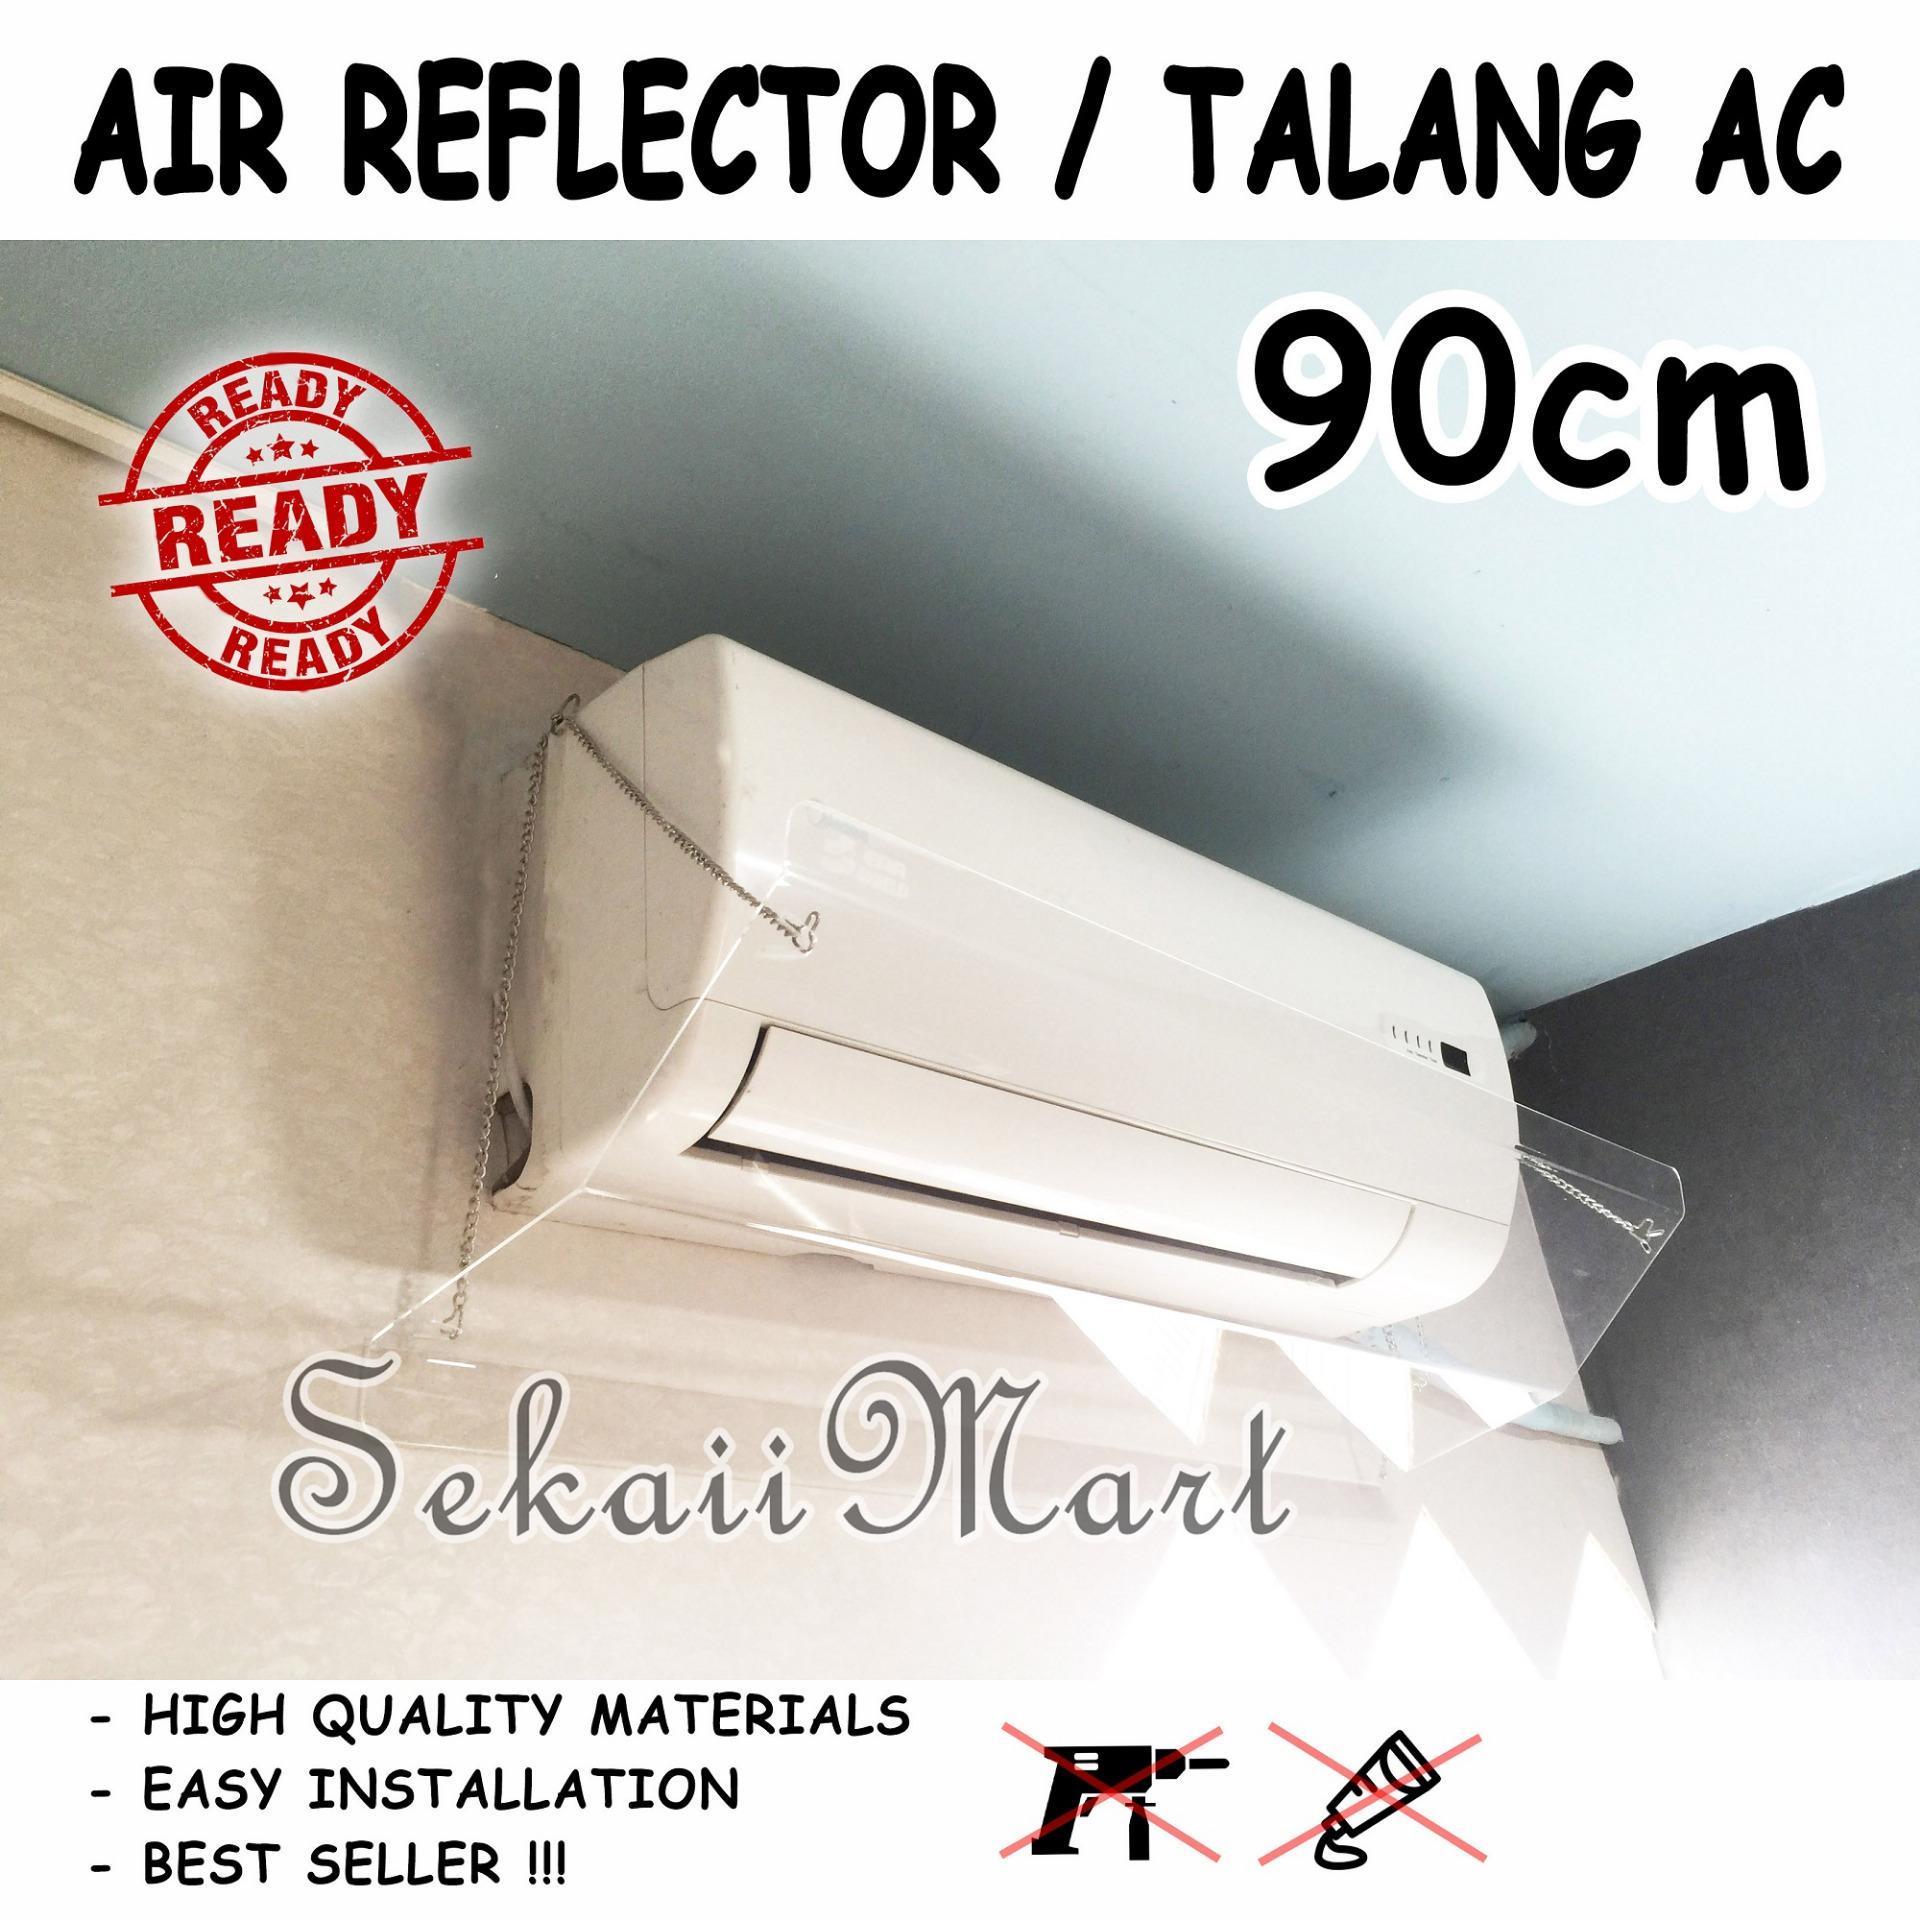 ES90 - TALANG AC ACRYLIC - AKRILIK AC - PENAHAN HEMBUSAN ANGIN AC 90cm